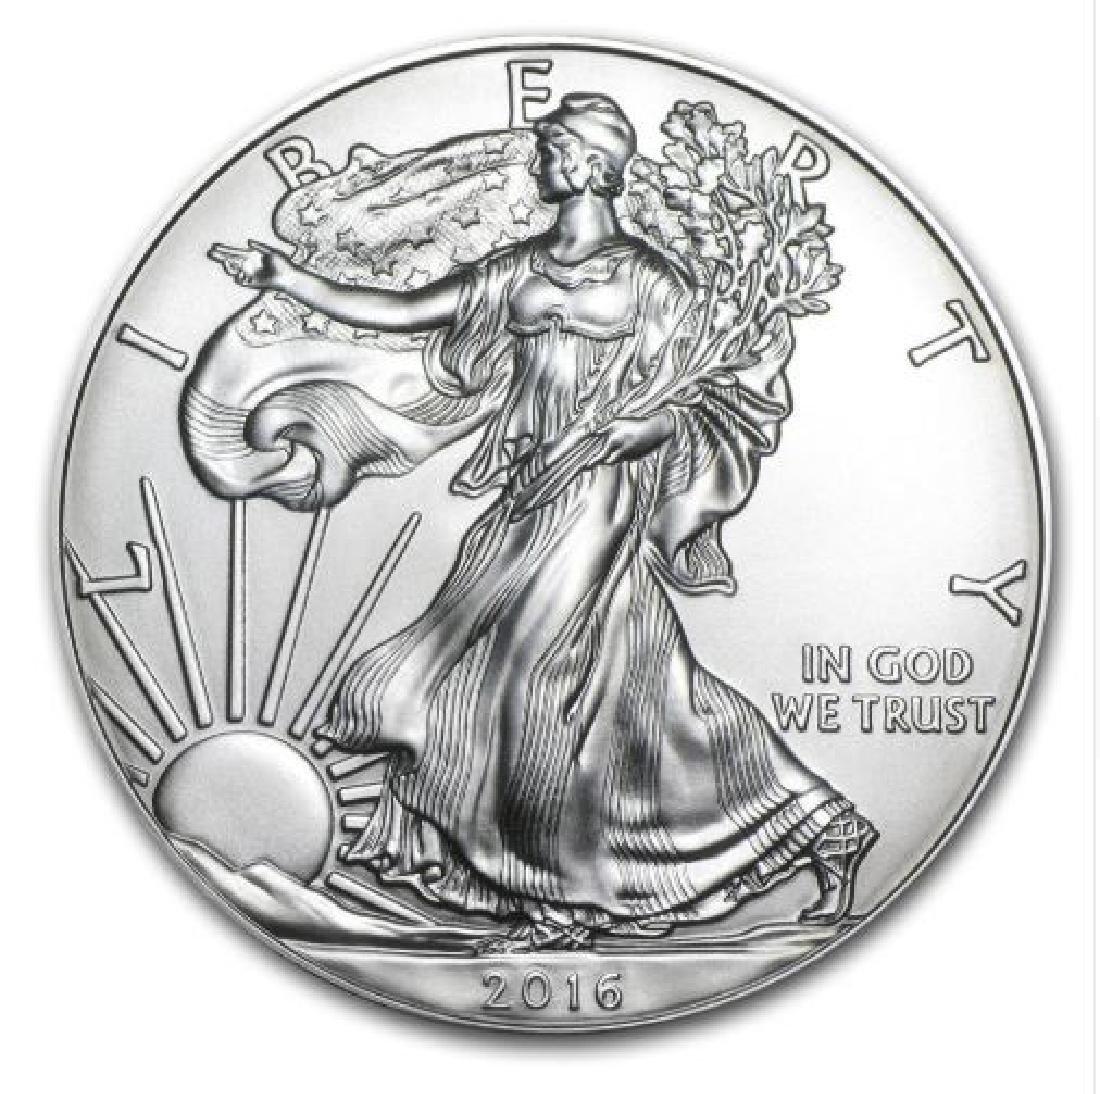 Walking Liberty 1oz Silver clad coin